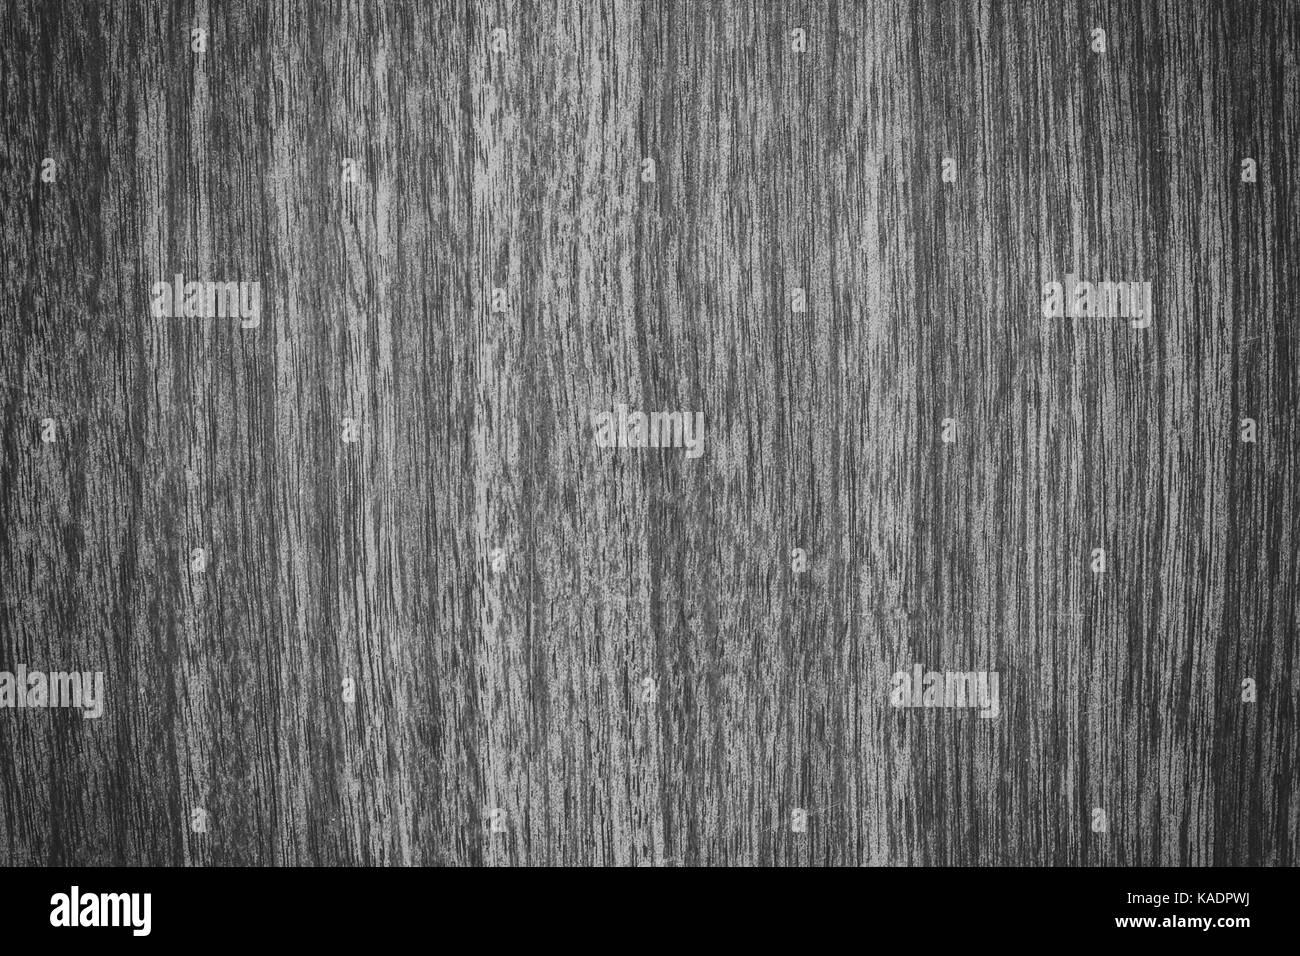 Resumen De Superficie Rústica Mesa De Madera Oscura